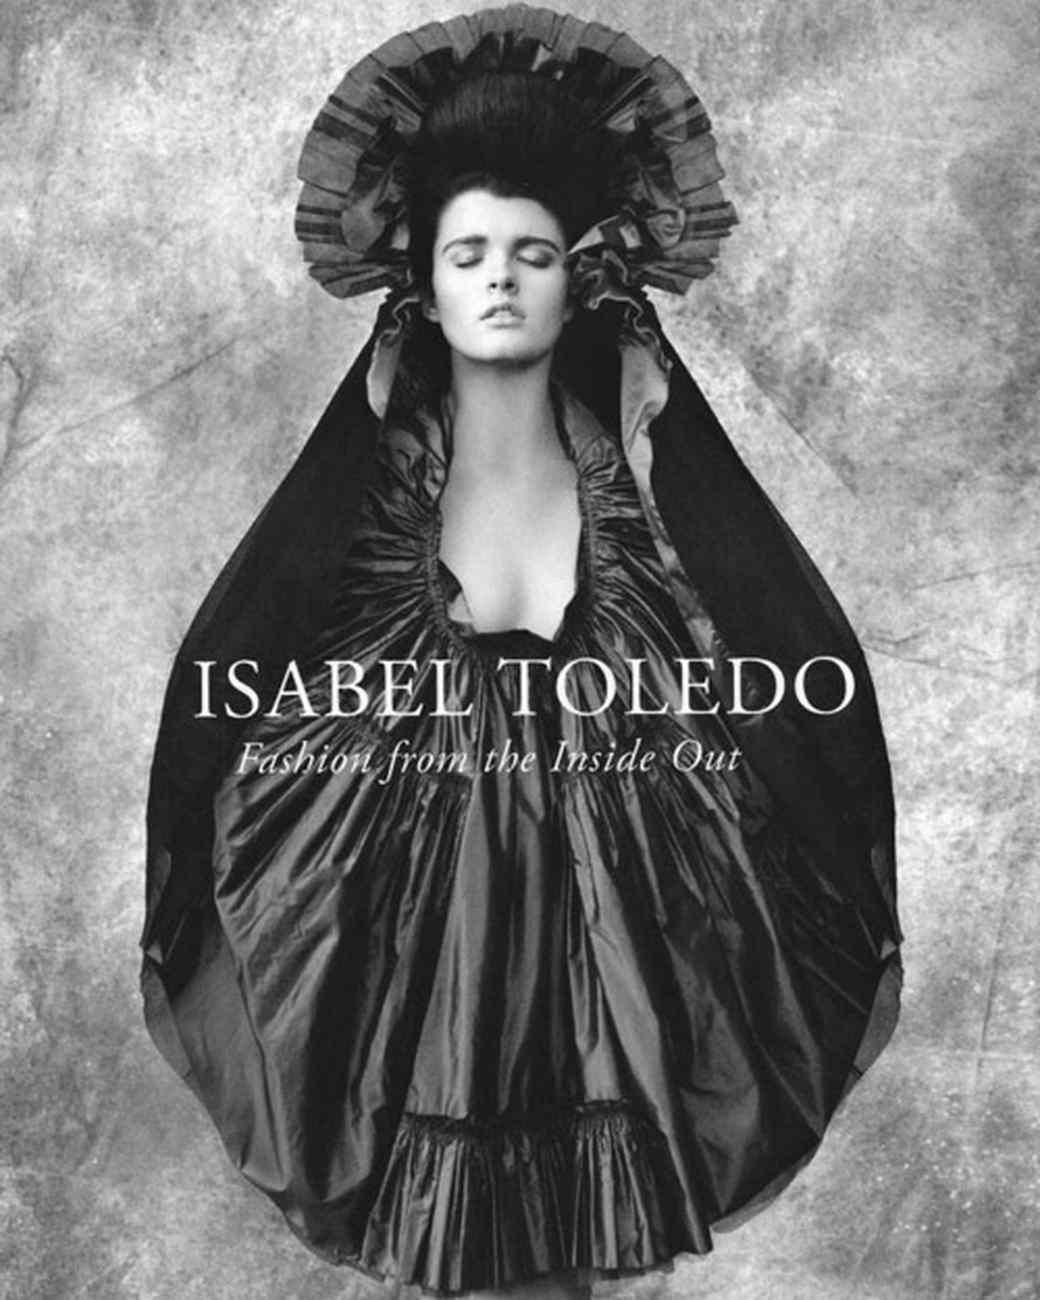 radio_toledo_book_cover_final_selection.jpg